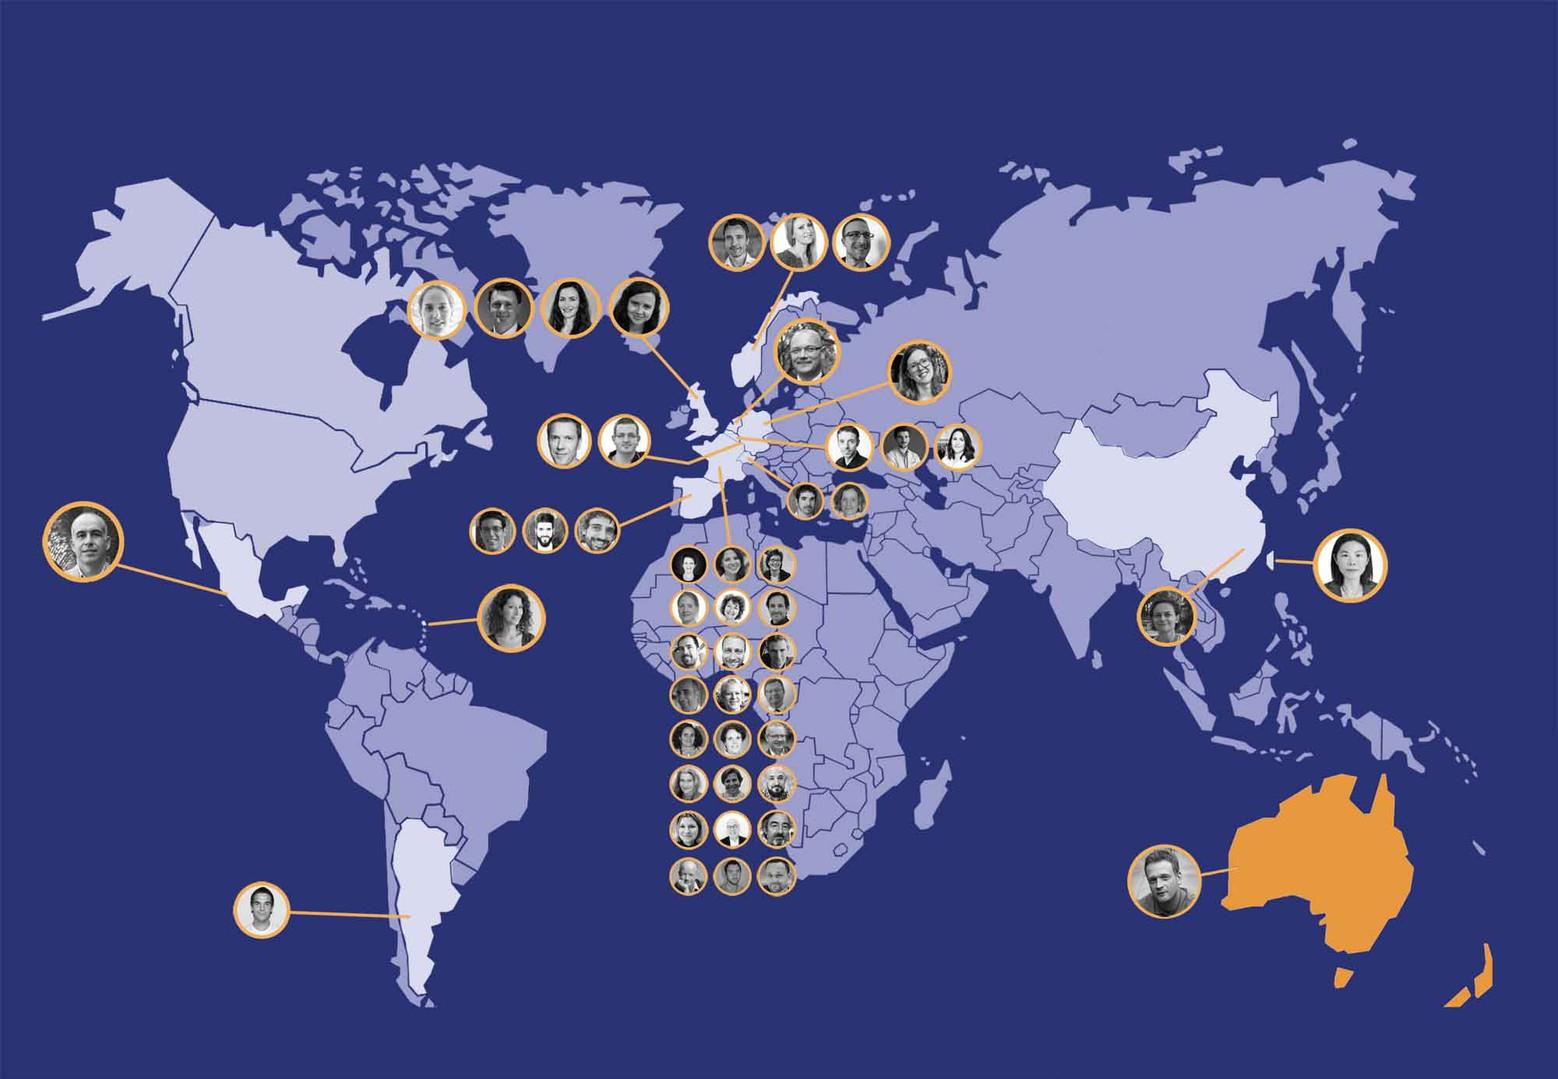 map-circulab-network-va copy.jpg